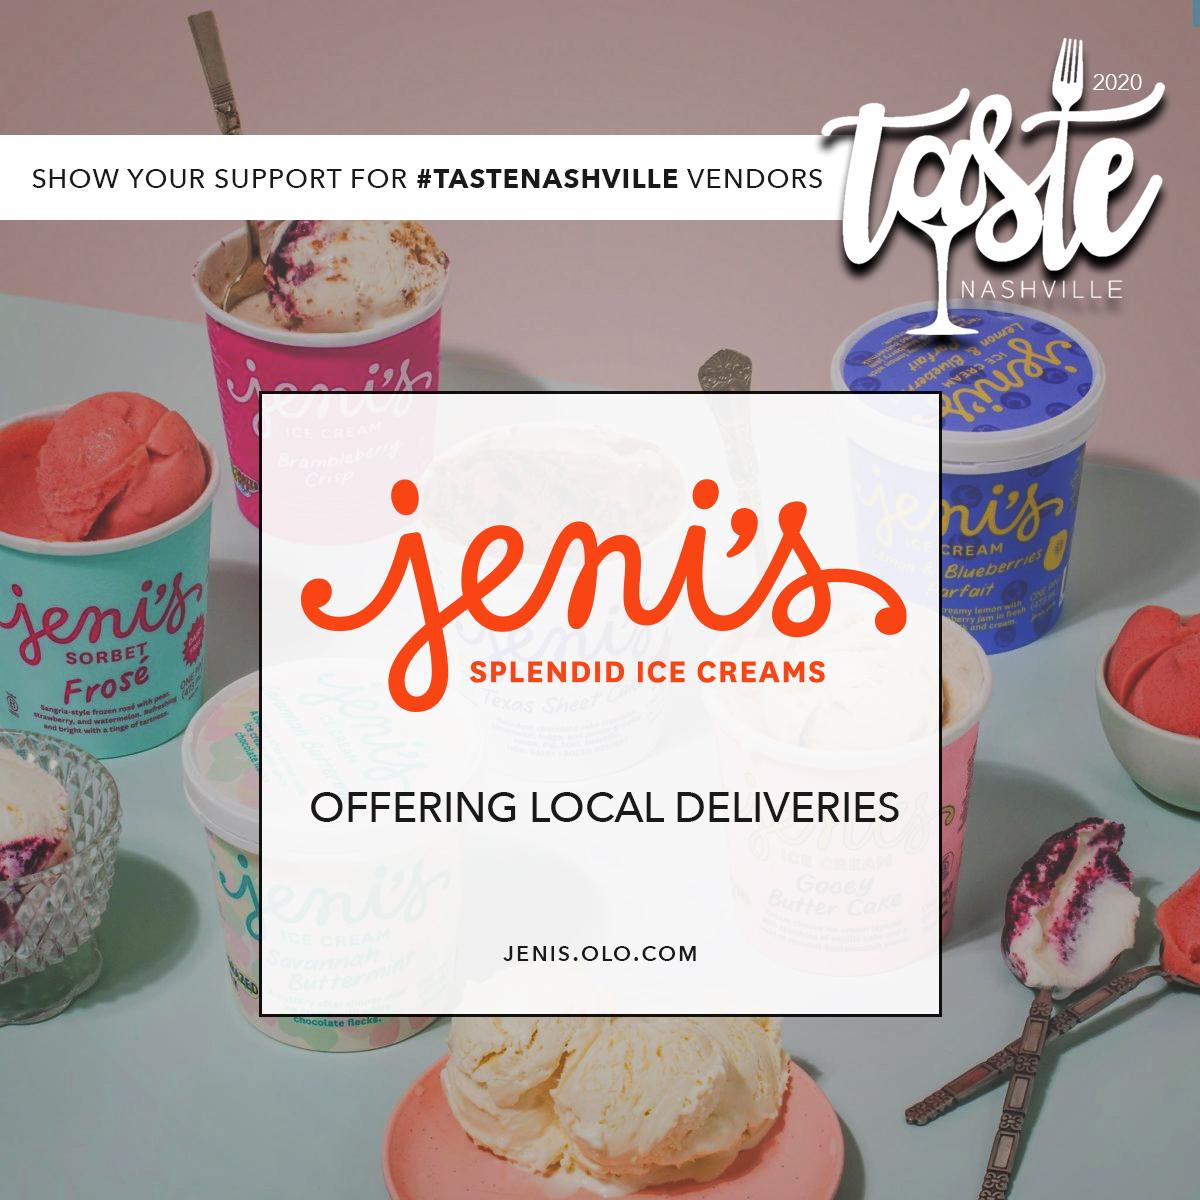 Support Jeni's Splendid Ice Creams